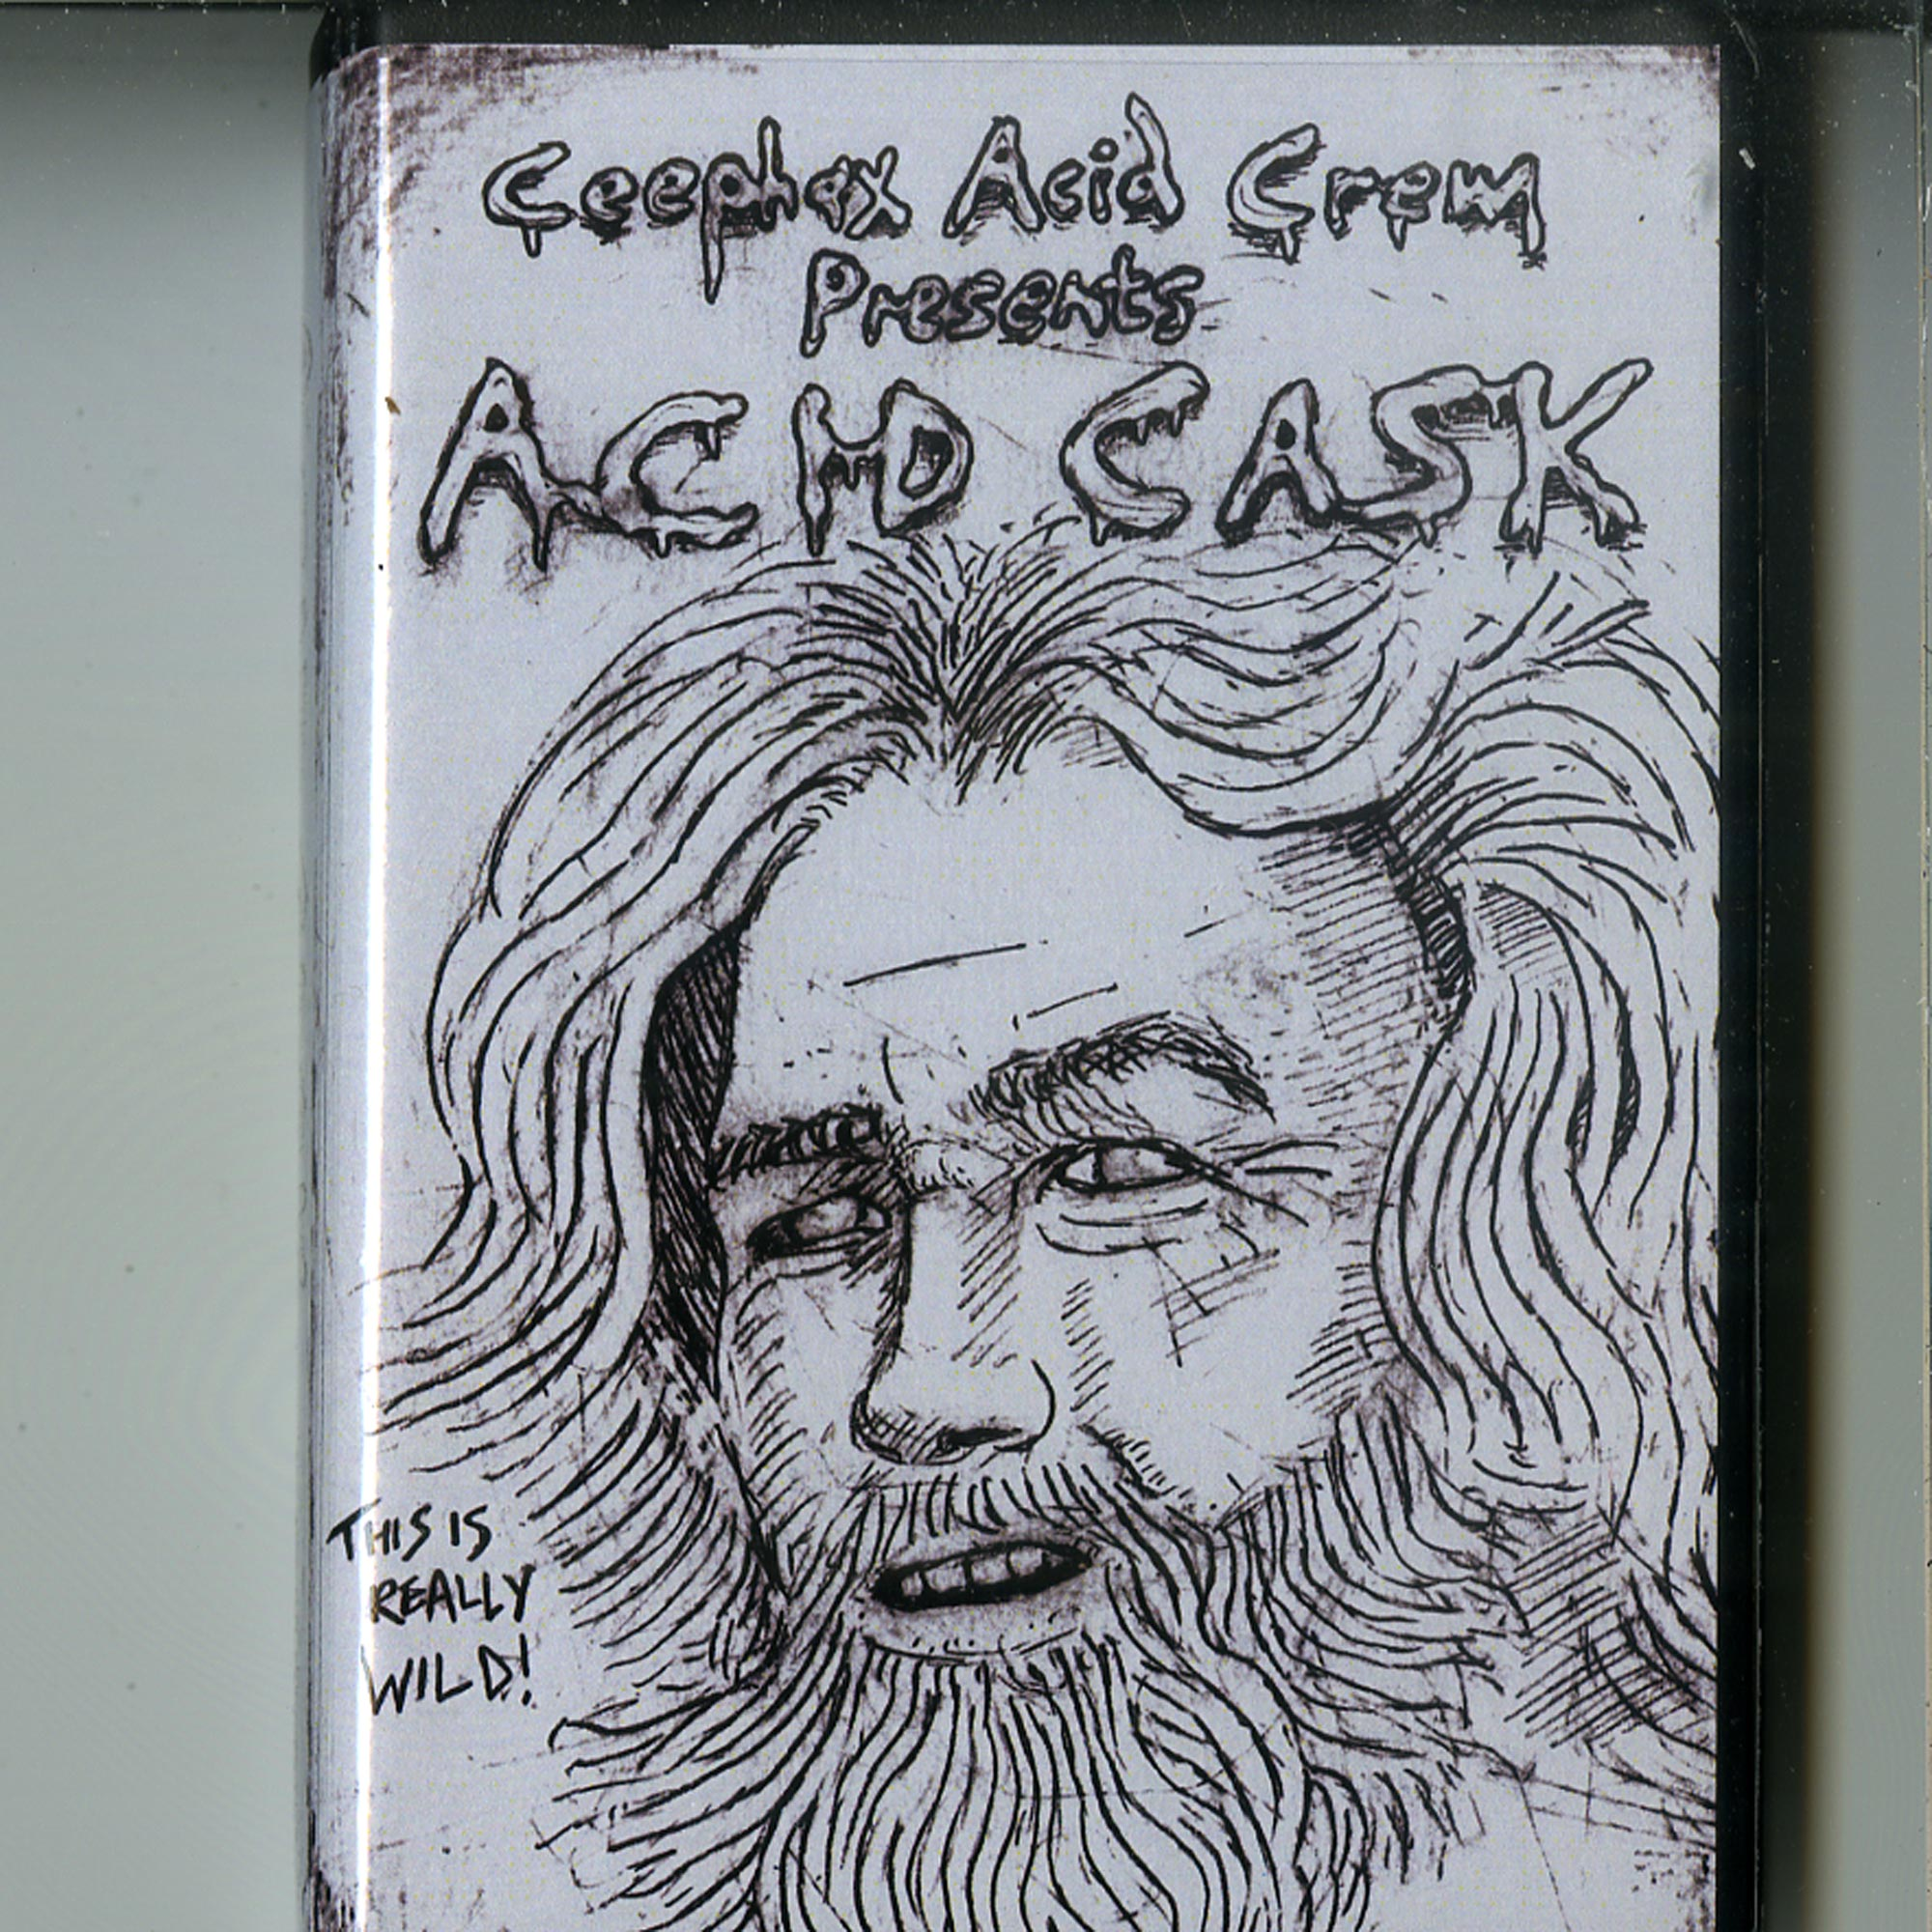 Ceephax Acid Crew - ACID CASK CASSETTE COMPILATION